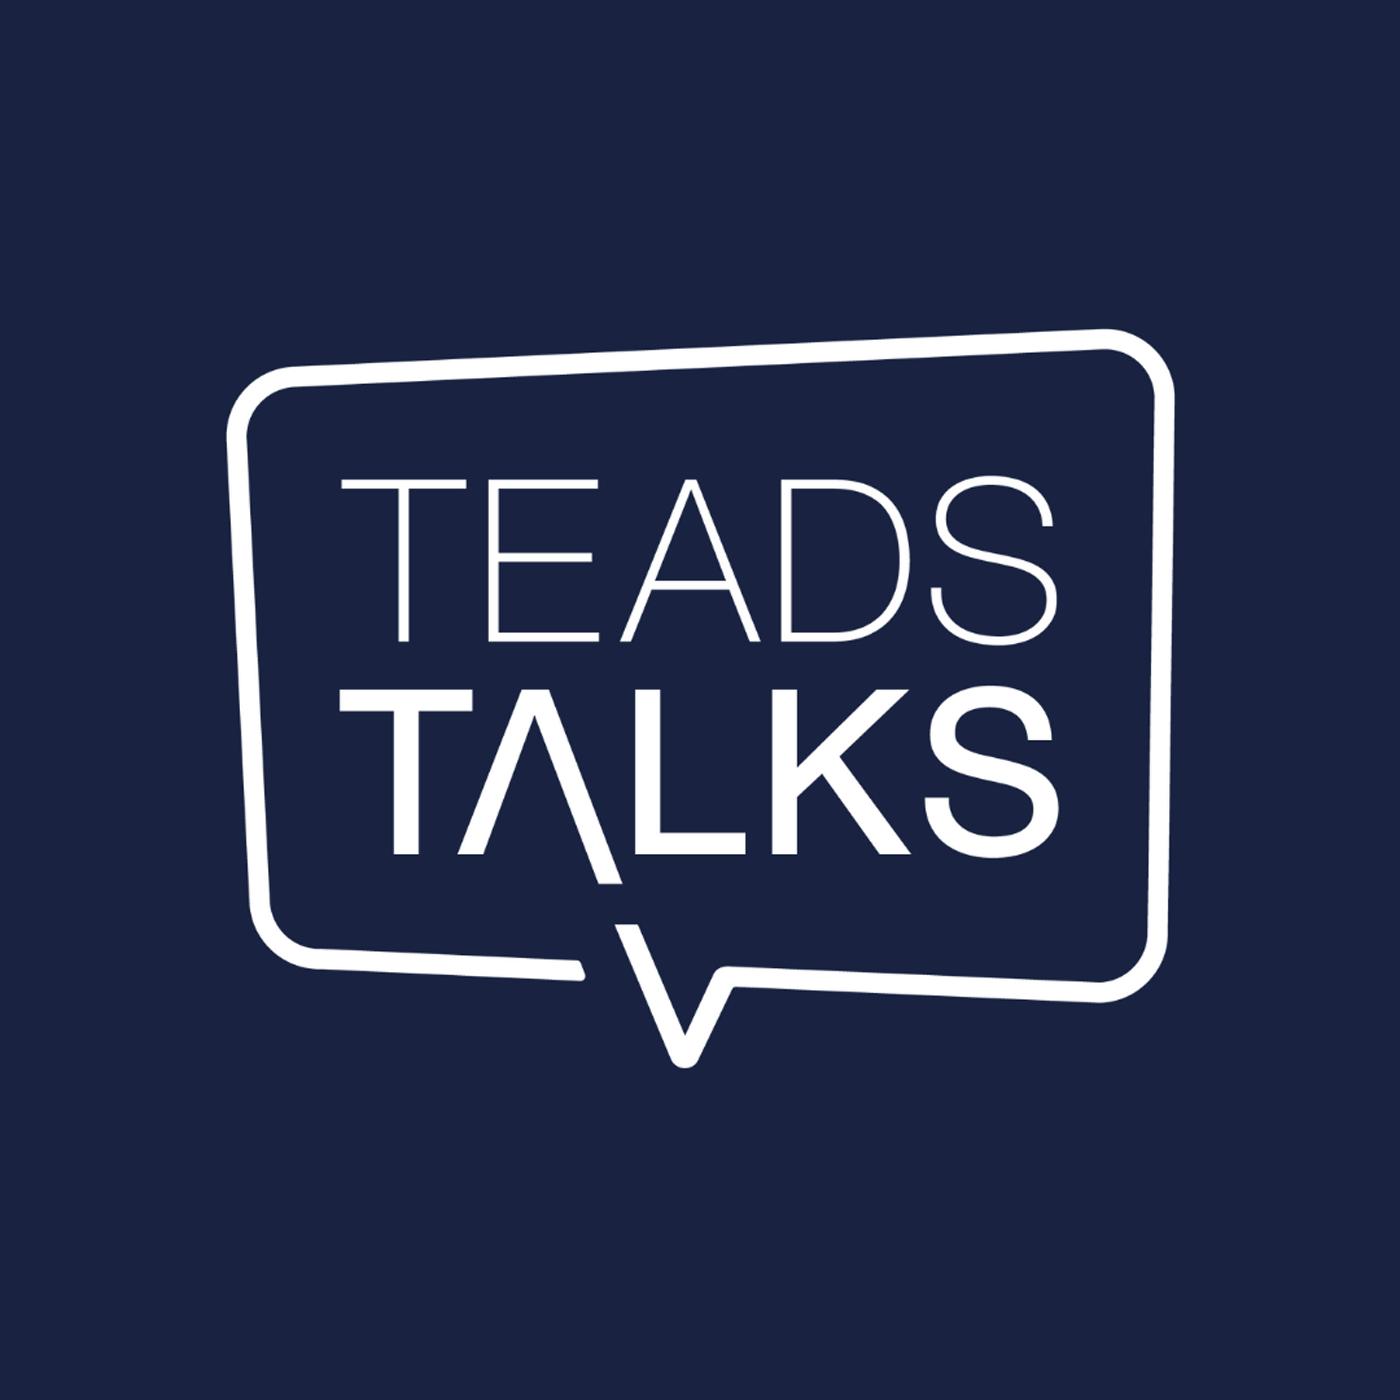 Show artwork for Teads Talks